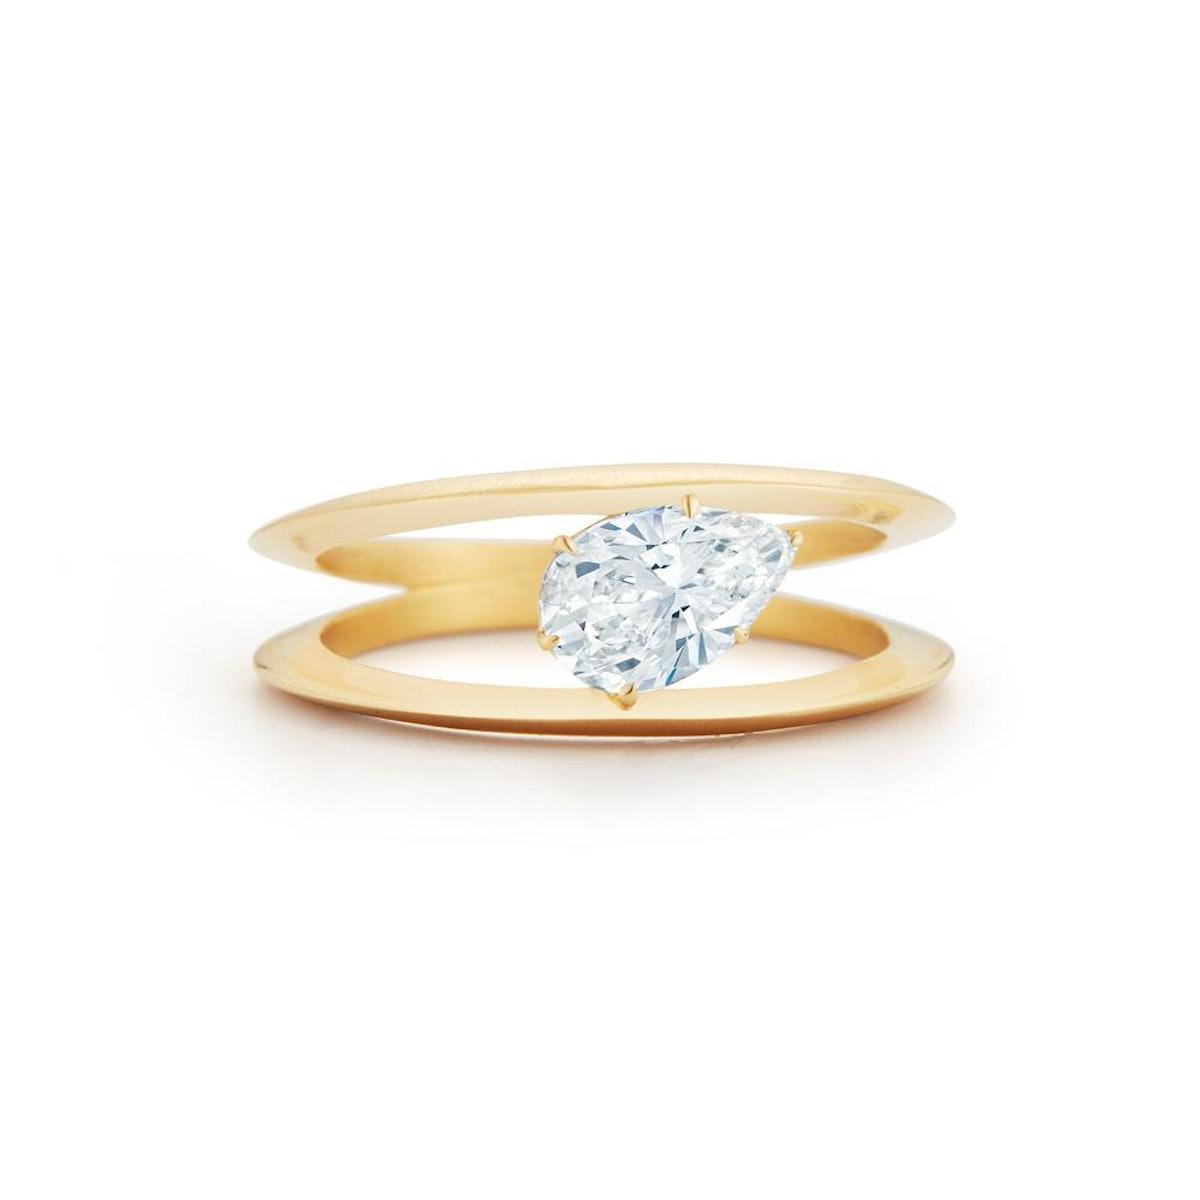 Sadie Solitaire Ring